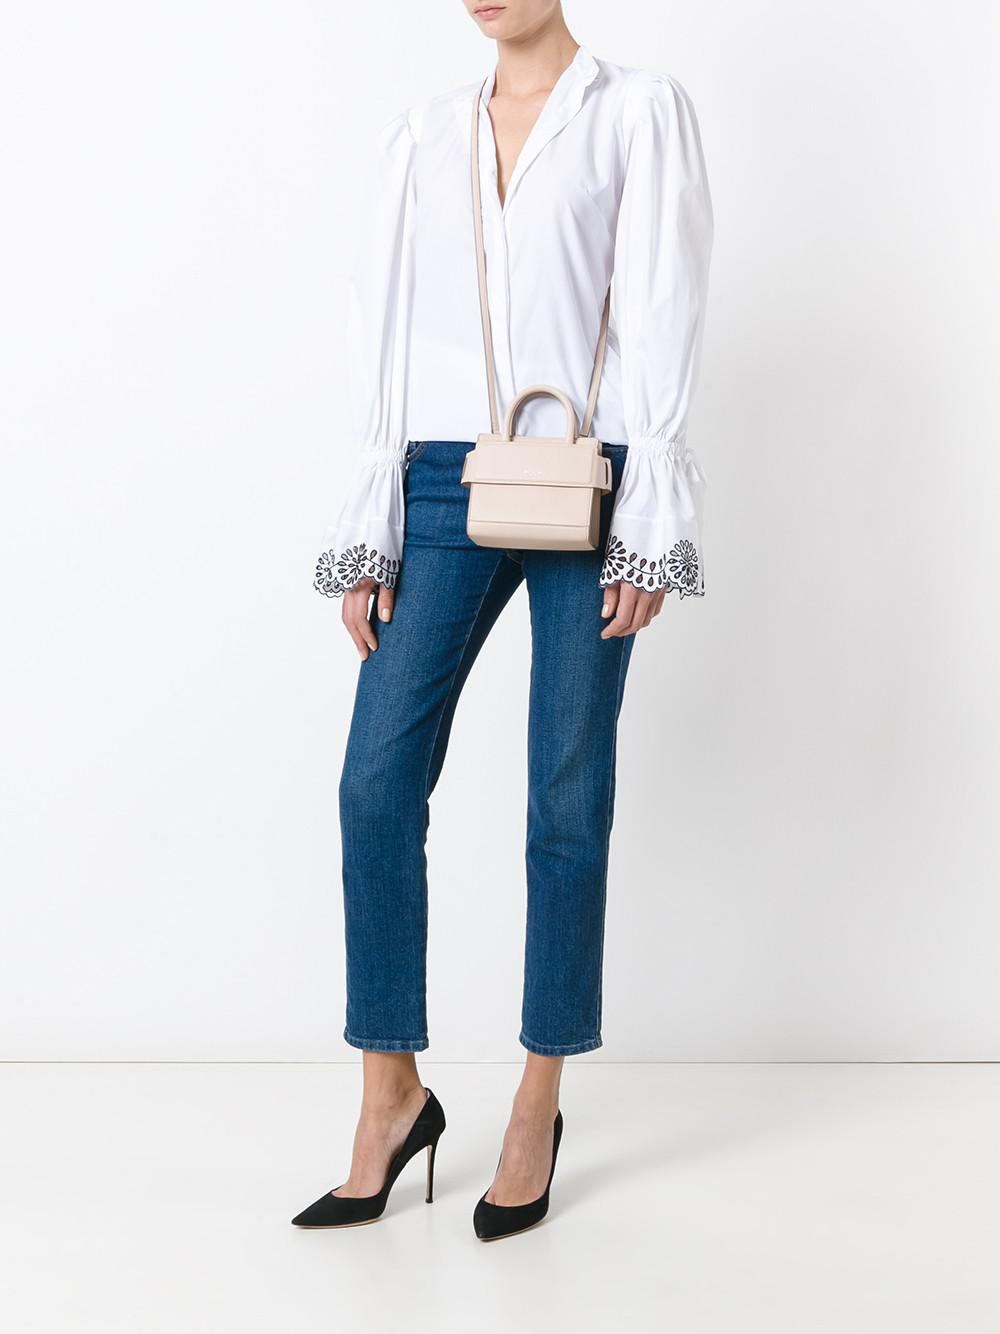 30804512c1 Lyst - Givenchy Horizon Nano Leather Crossbody Bag